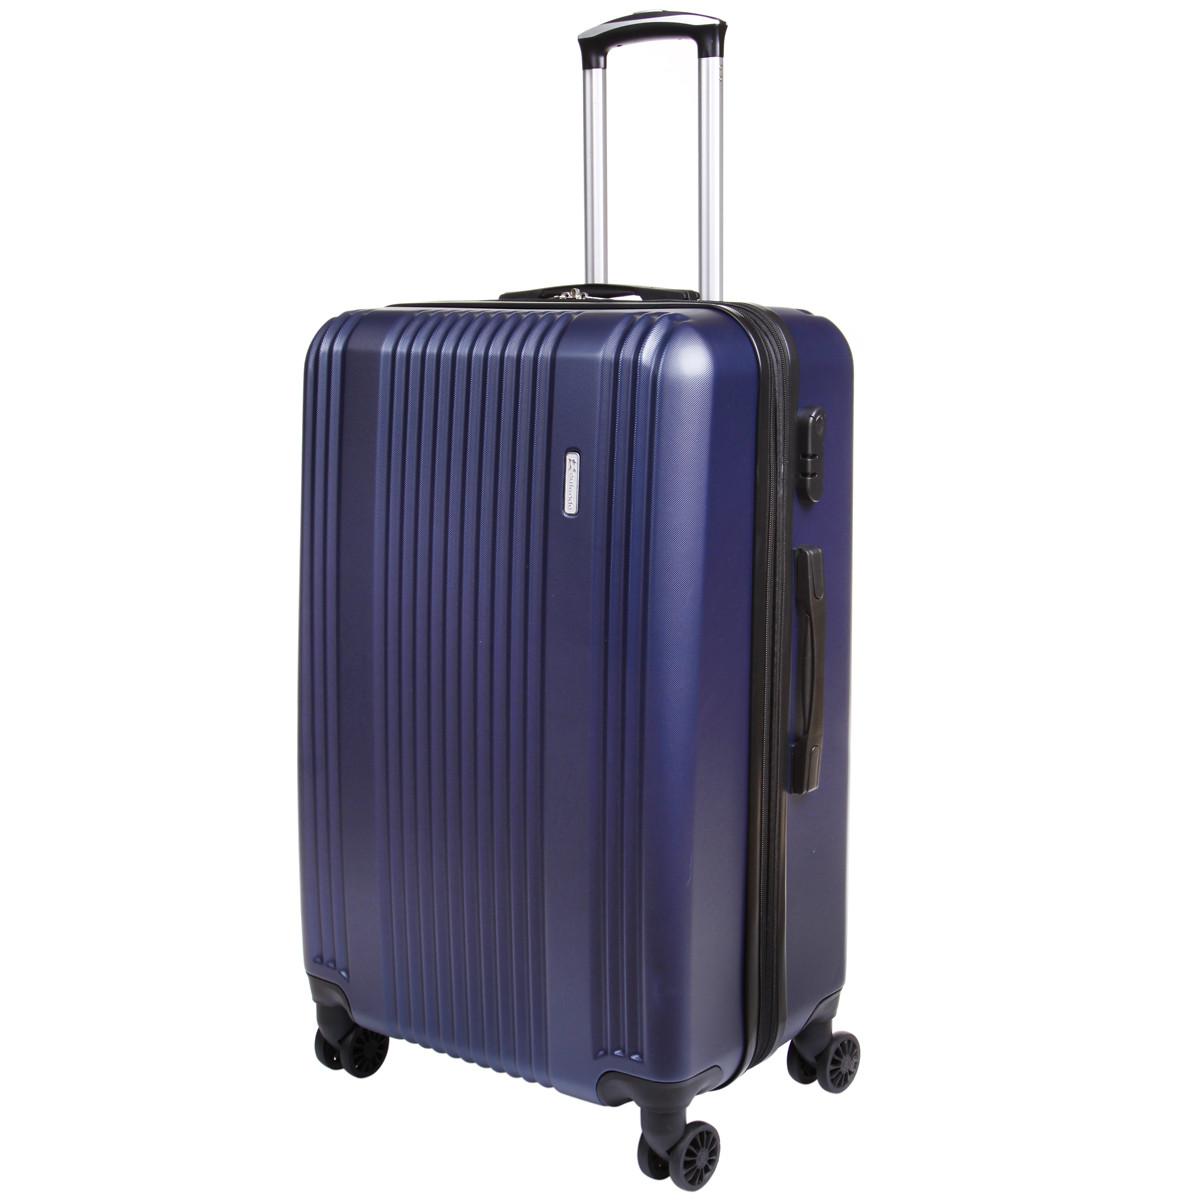 Чемодан OULANDO большой 4 колеса расширение пластик ABS  47х70х30(+3) синий  ксЛ516-28син